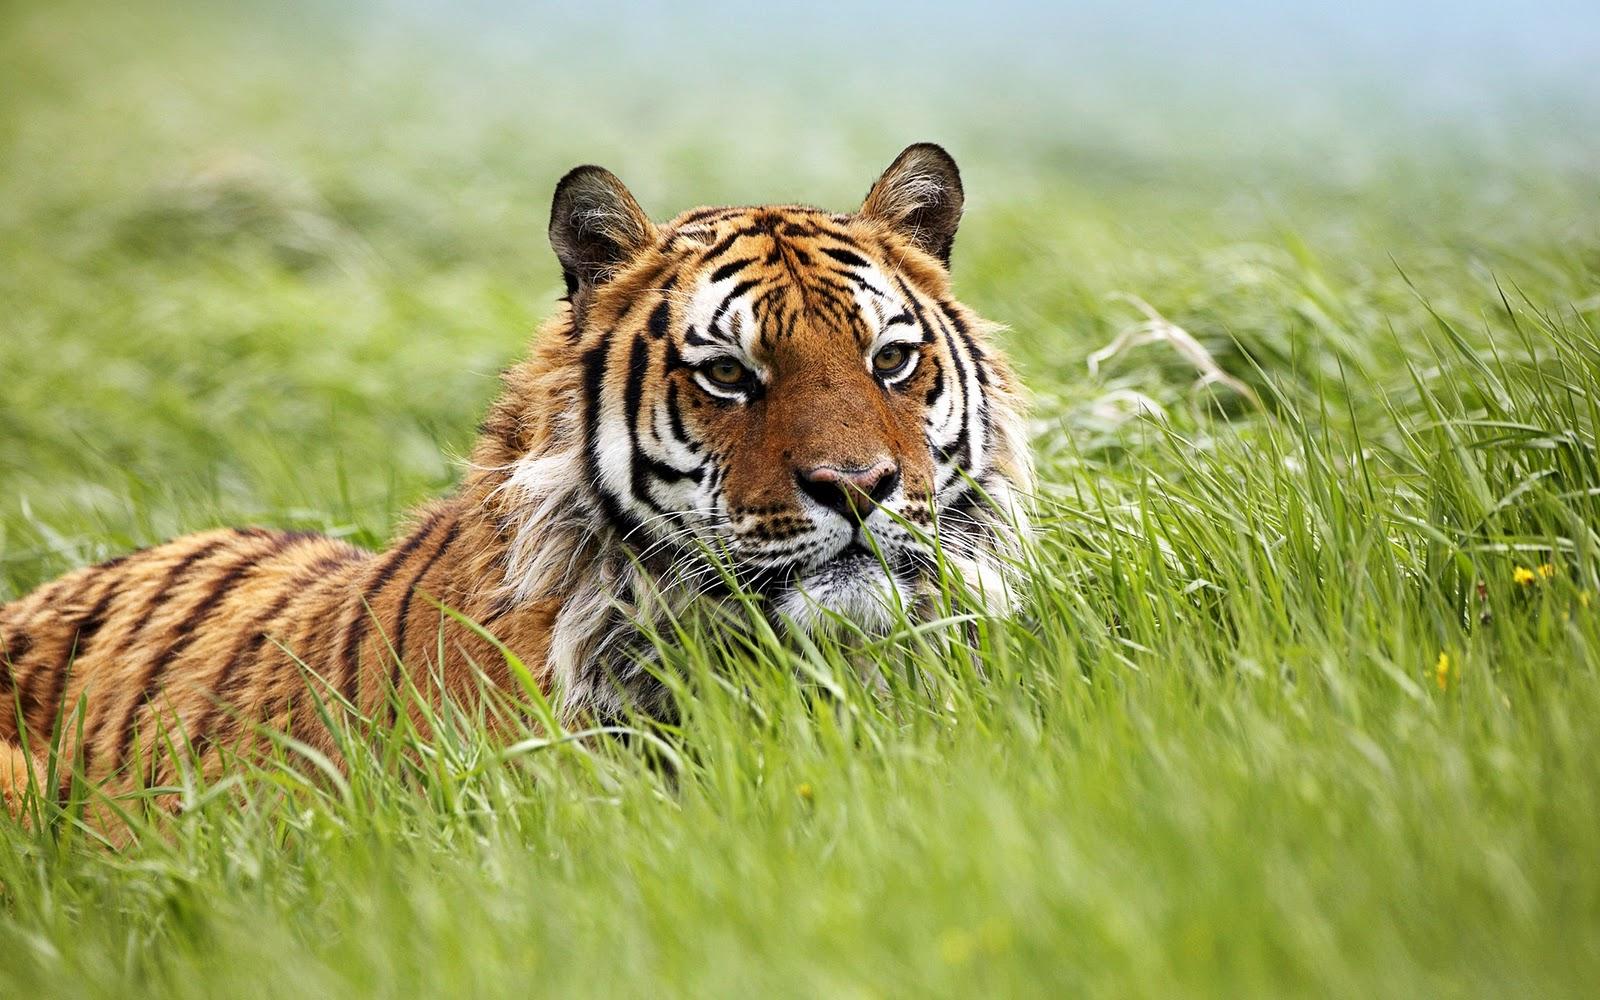 tiger wallpaper widescreen - photo #10